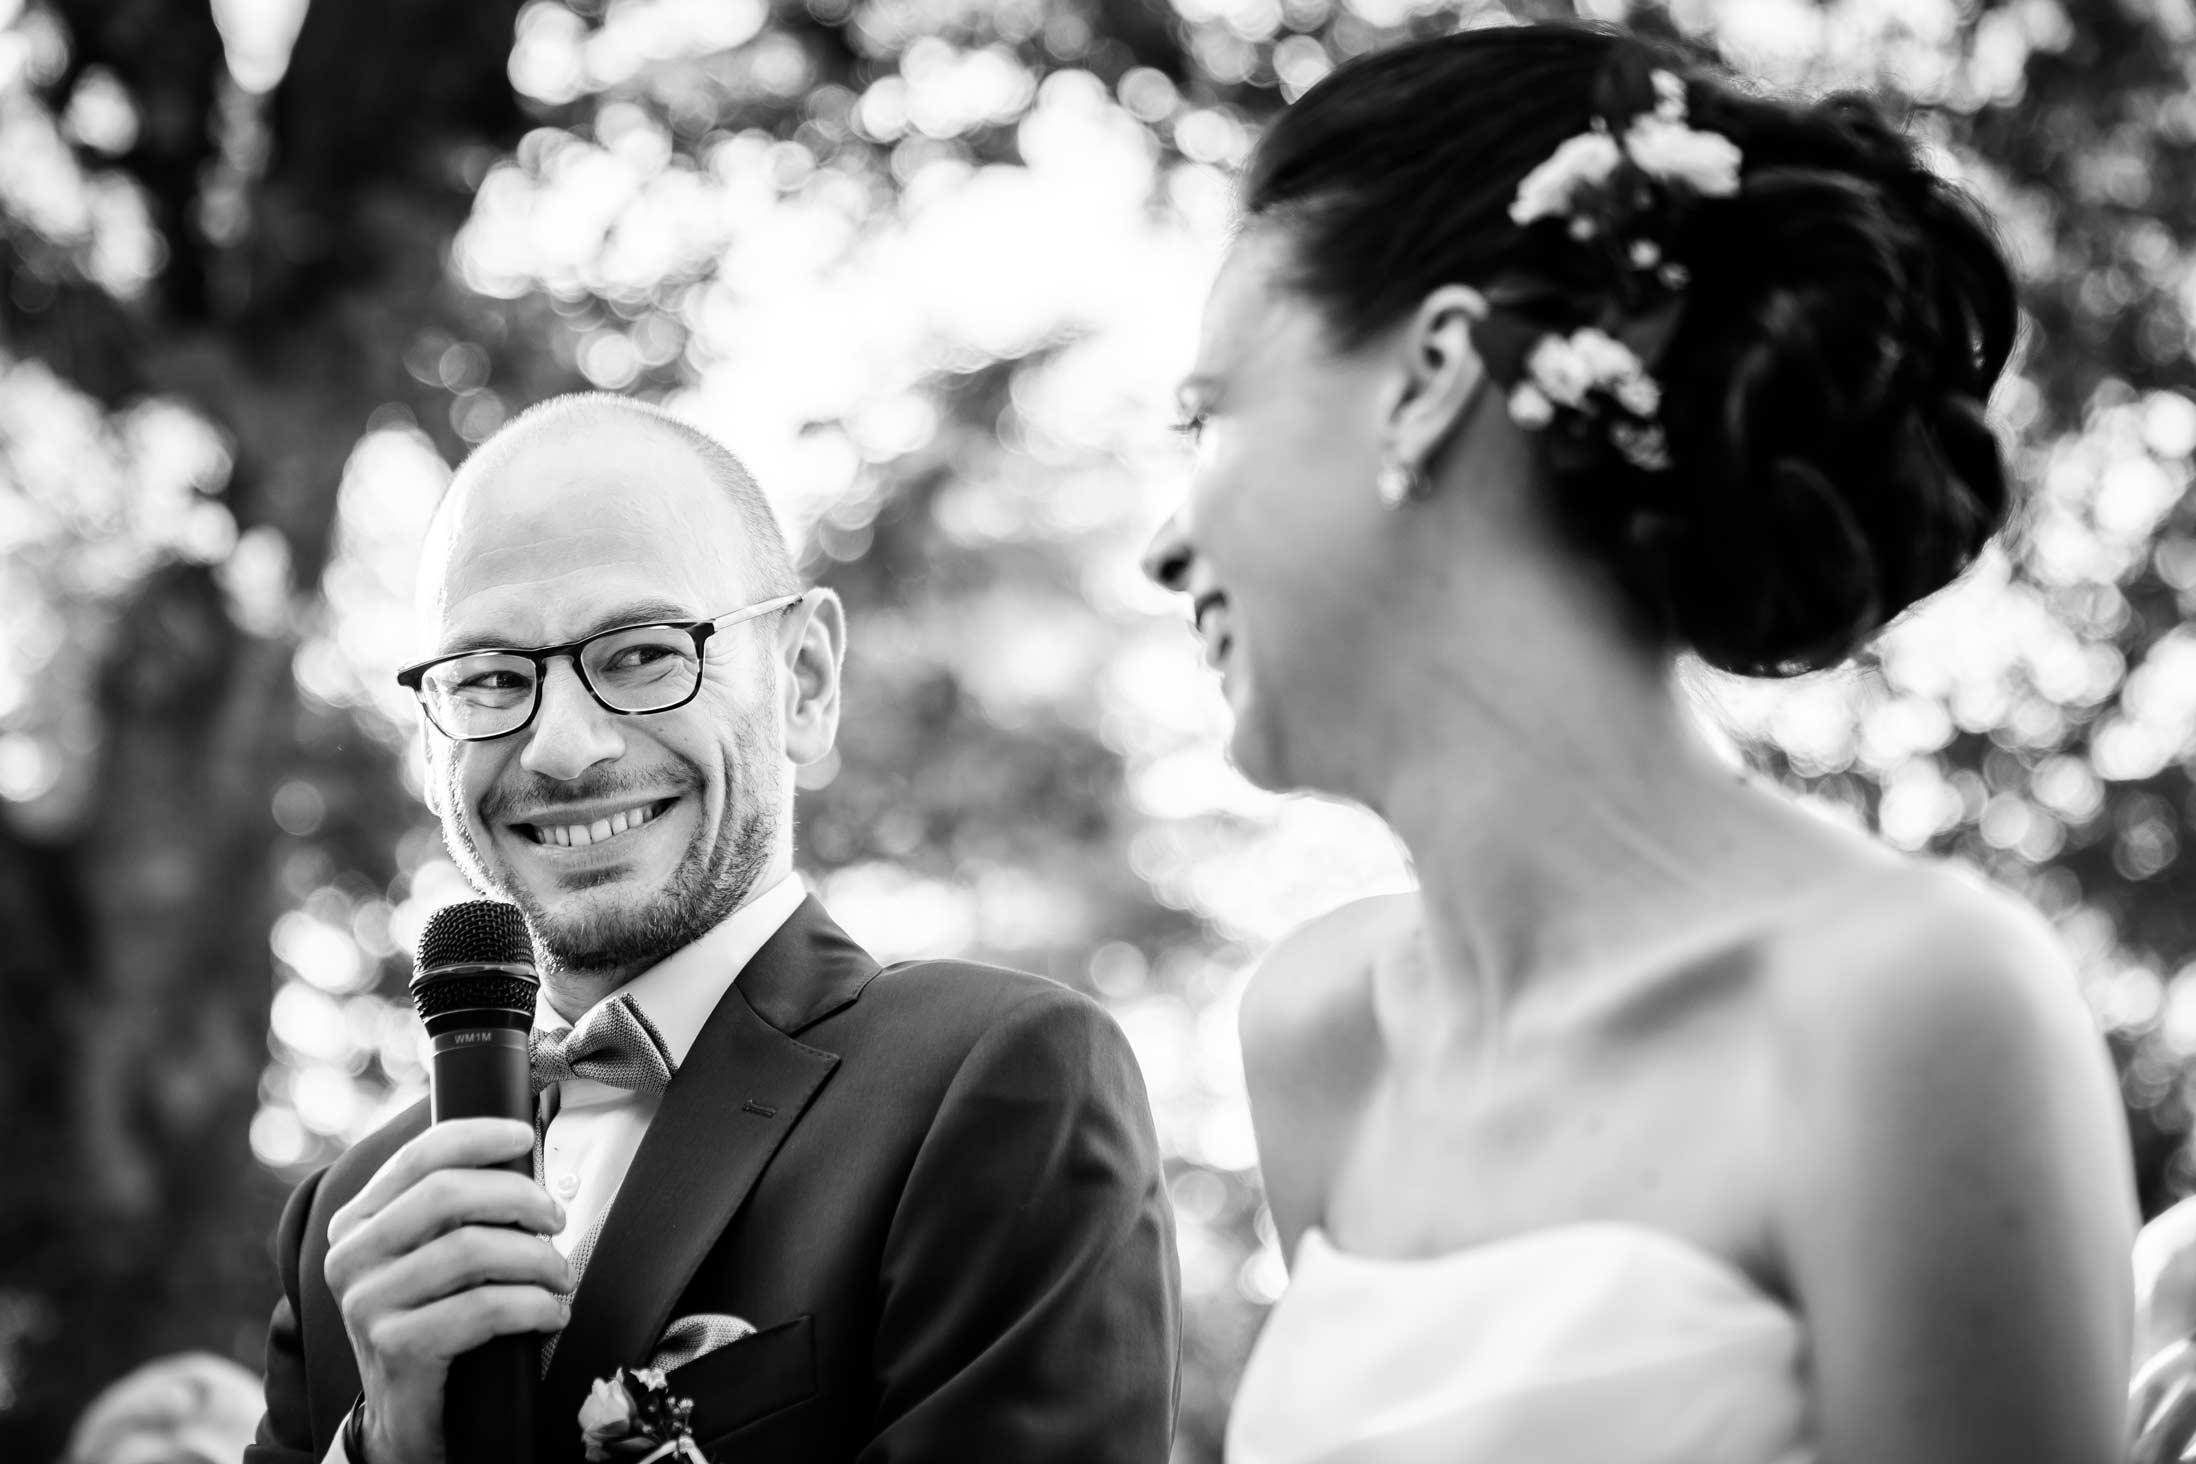 Fotografo-Matrimonio-Roma-Reportage-Cerimonia-1